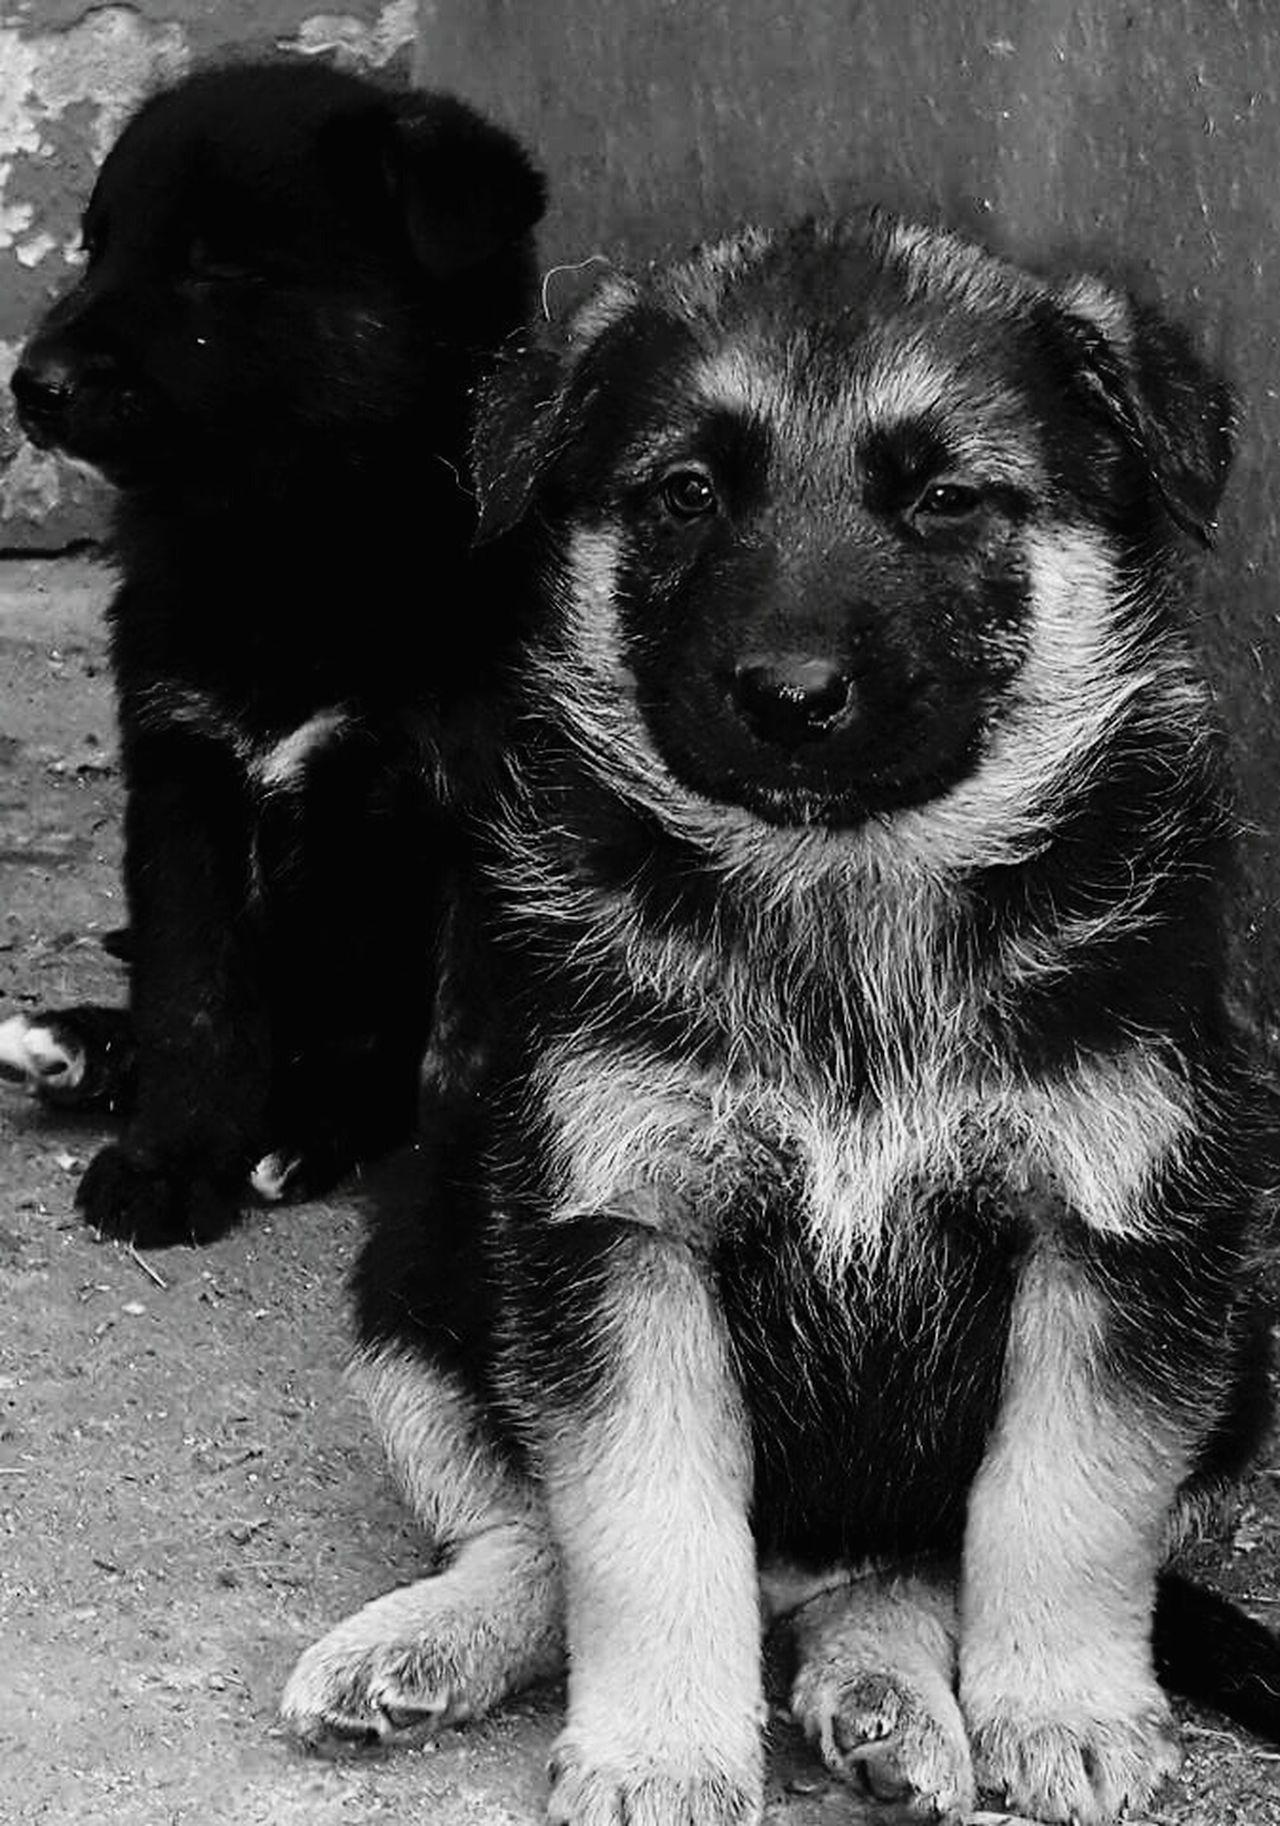 My Year My View Animal Themes Dog Pets Domestic Animals Dogs Dog❤ Dog Lover Doglover DogLove Dogoftheday Dog Portrait Dog Photography Dogmodel Doggy Doggy Love Dogphoto